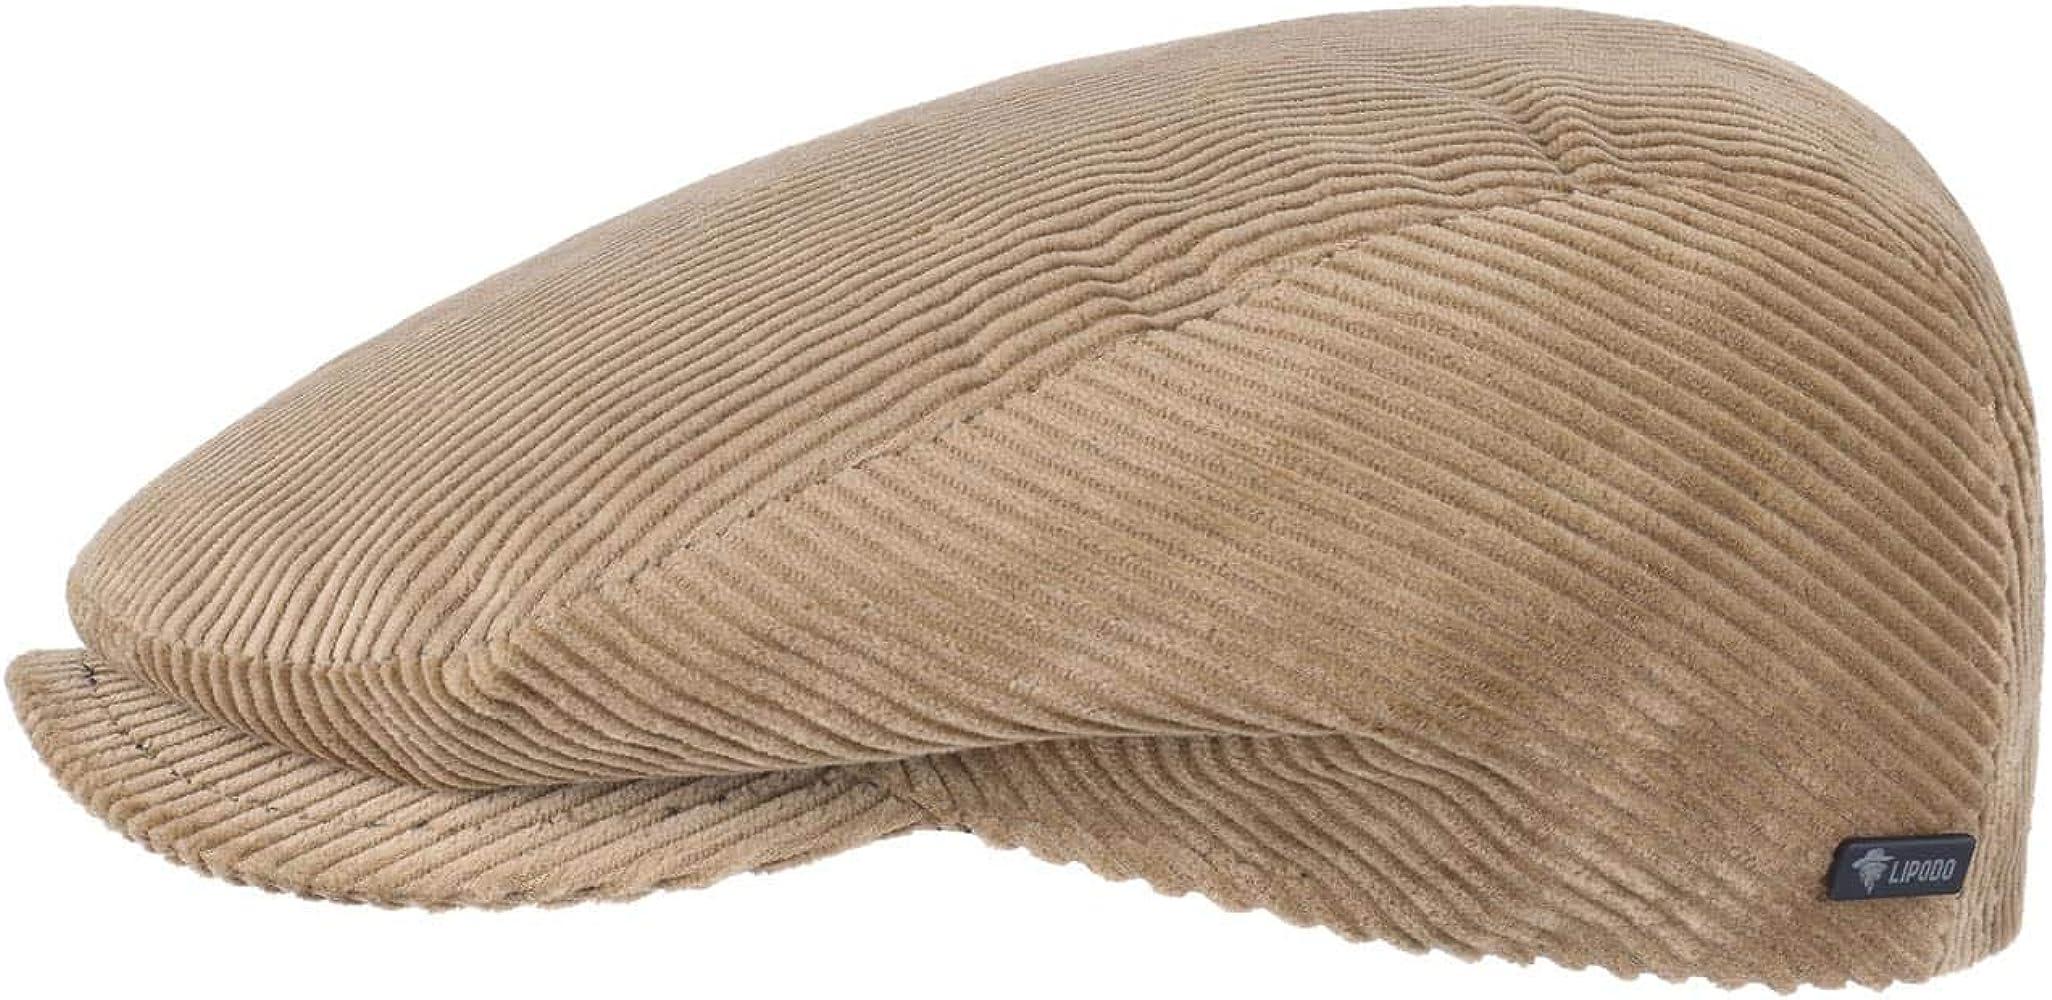 Lipodo Gorra Gatsby Cordial Algodón - Beige - Talla 49 cm - Gorra de Pana de Hombre con Forro Acolchado para Invierno - Gorra Deportiva: Amazon.es: Ropa y accesorios